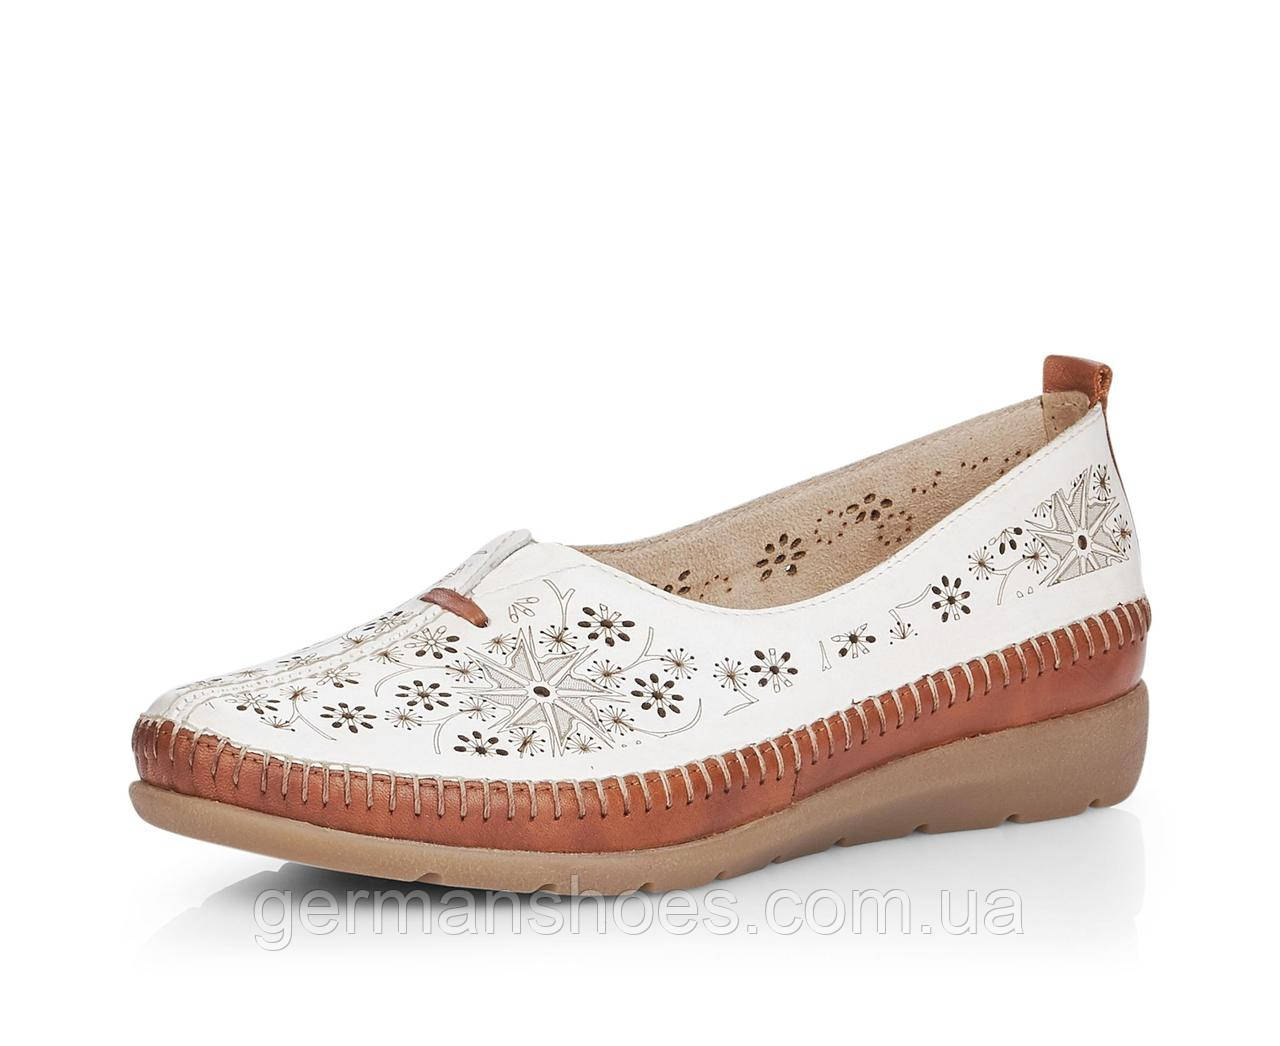 Туфли женские Remonte D1931-80